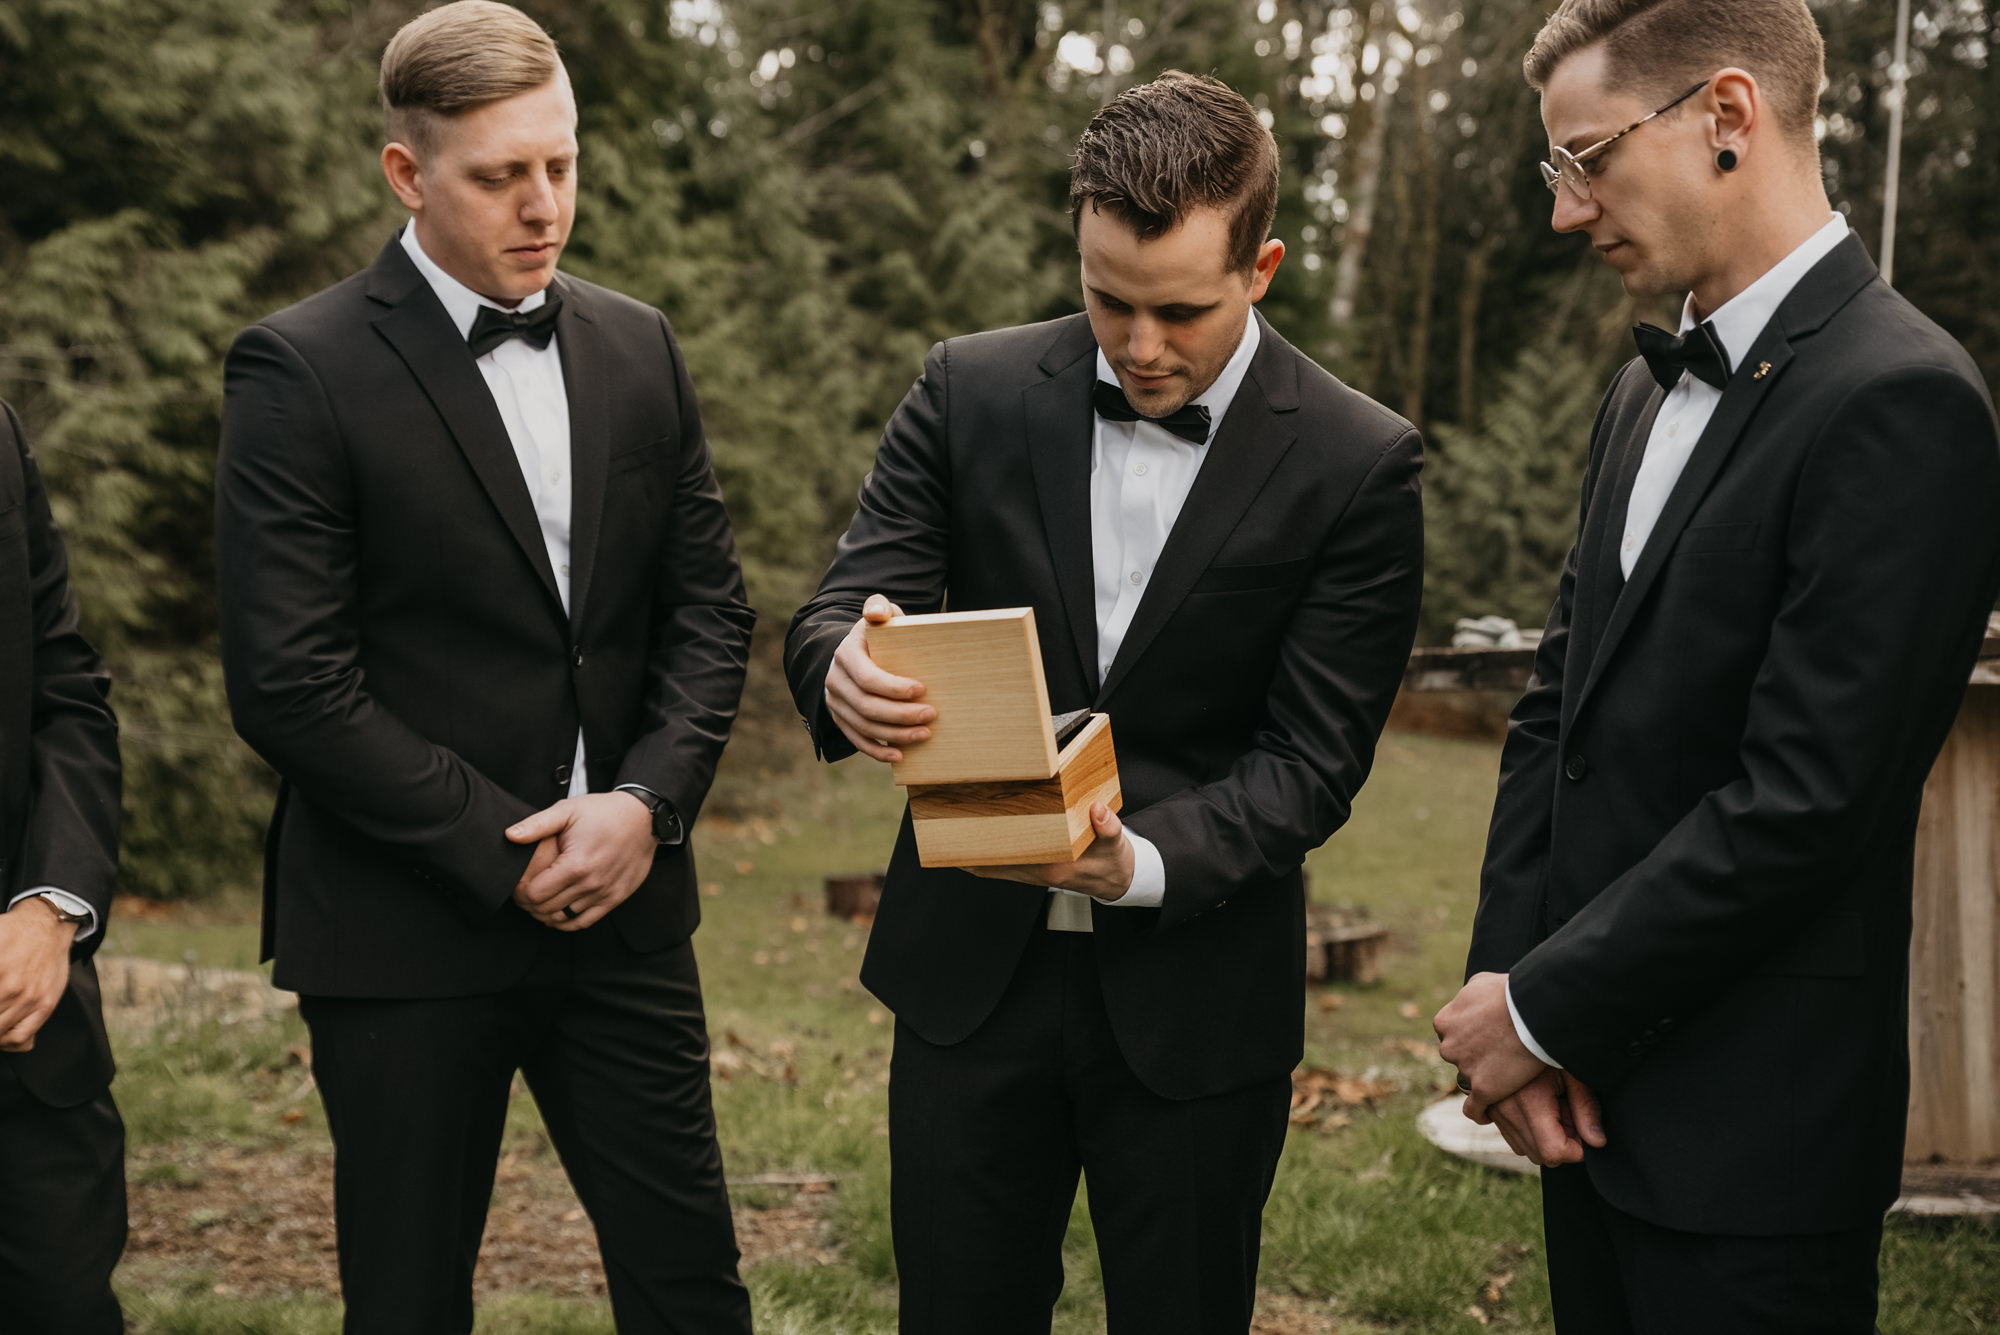 getting-ready-photos-seattle-weddings-groom-shinola-watch-2563.jpg